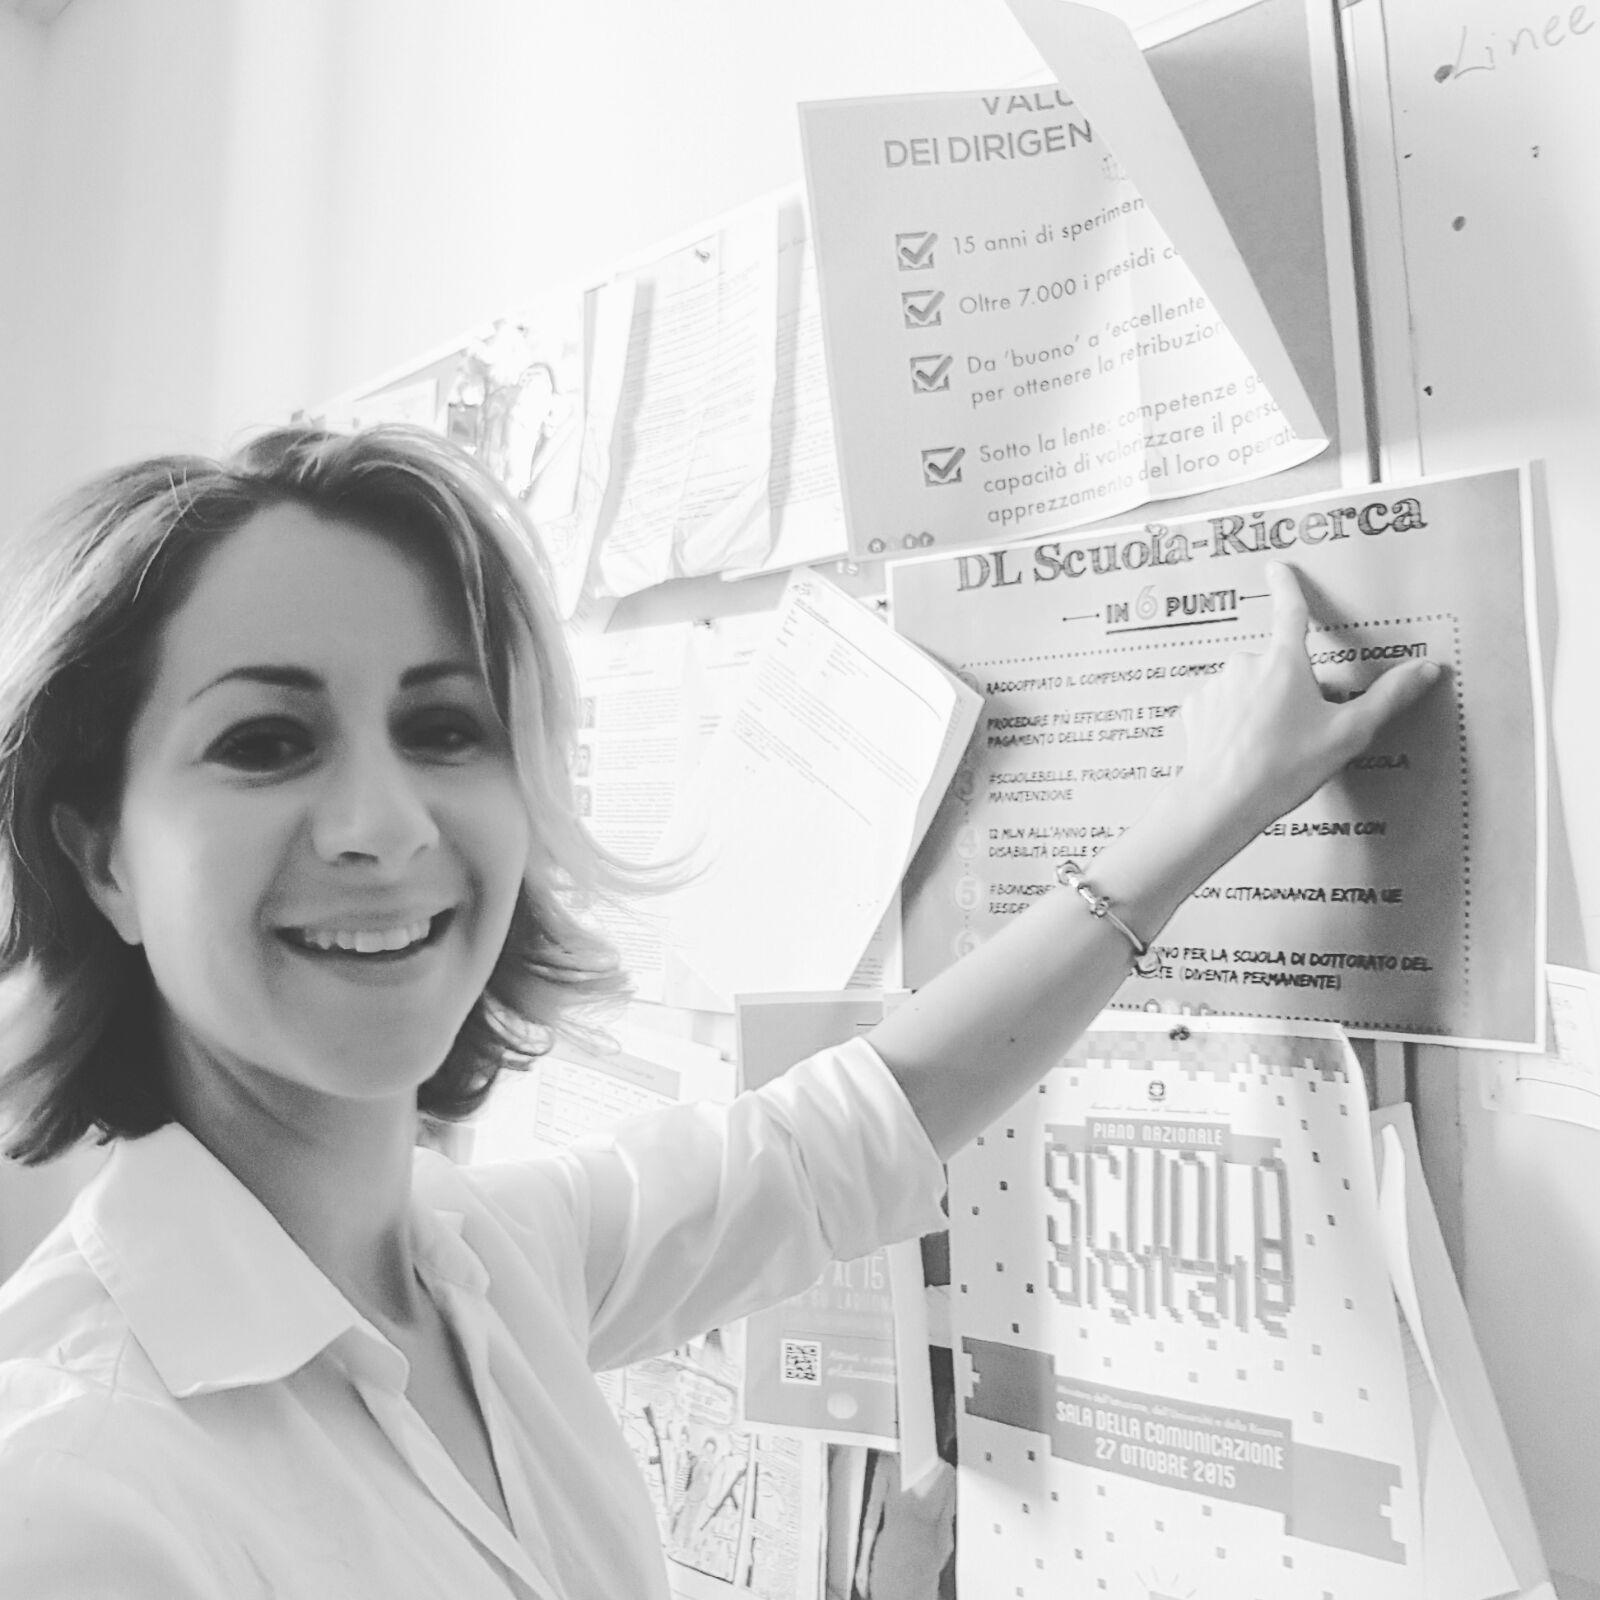 Alessandra Migliozzi